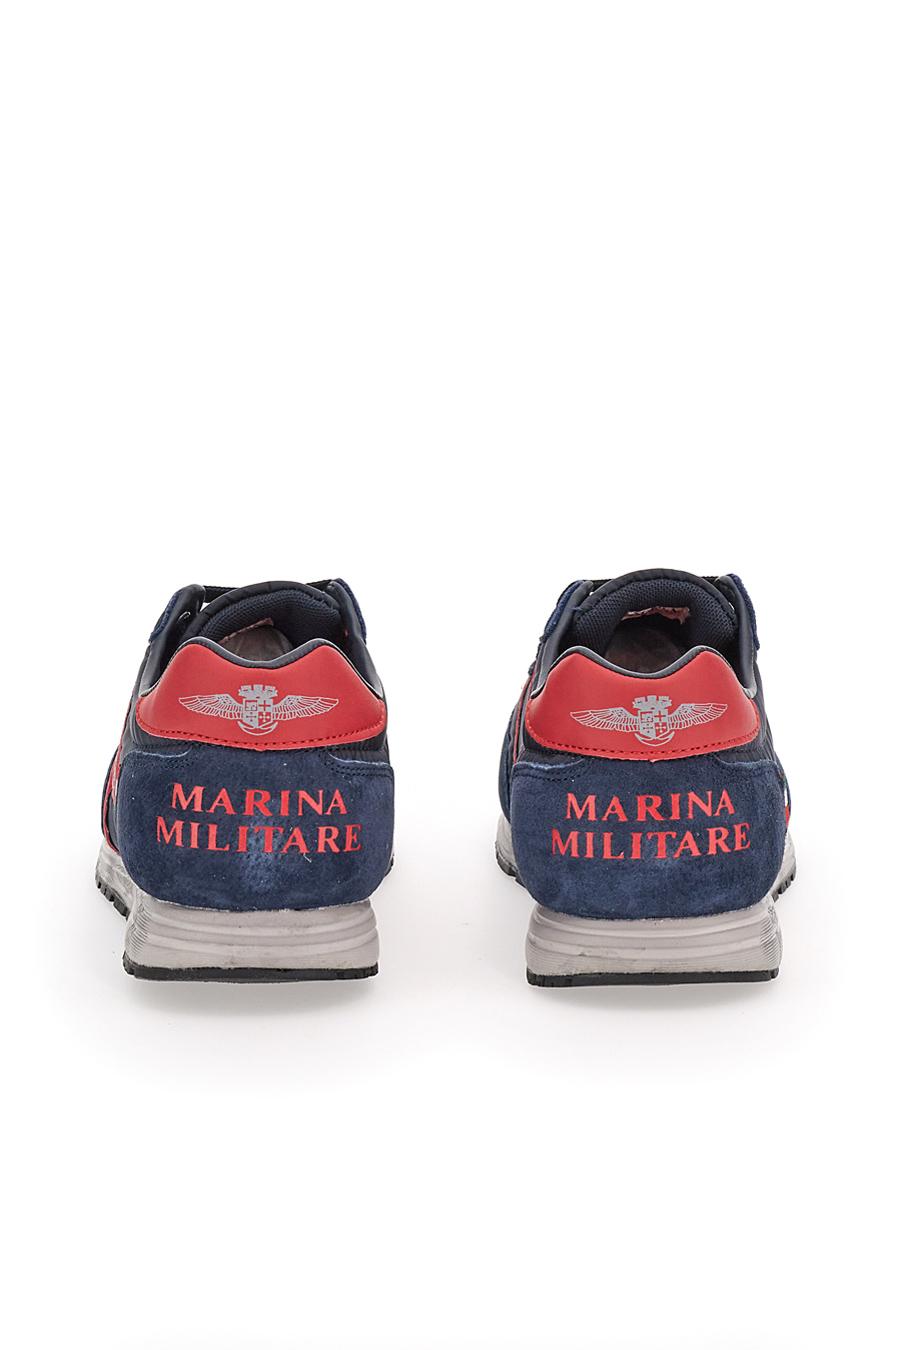 SNEAKERS uomo blu MARINA MILIT. 256 | Pittarello